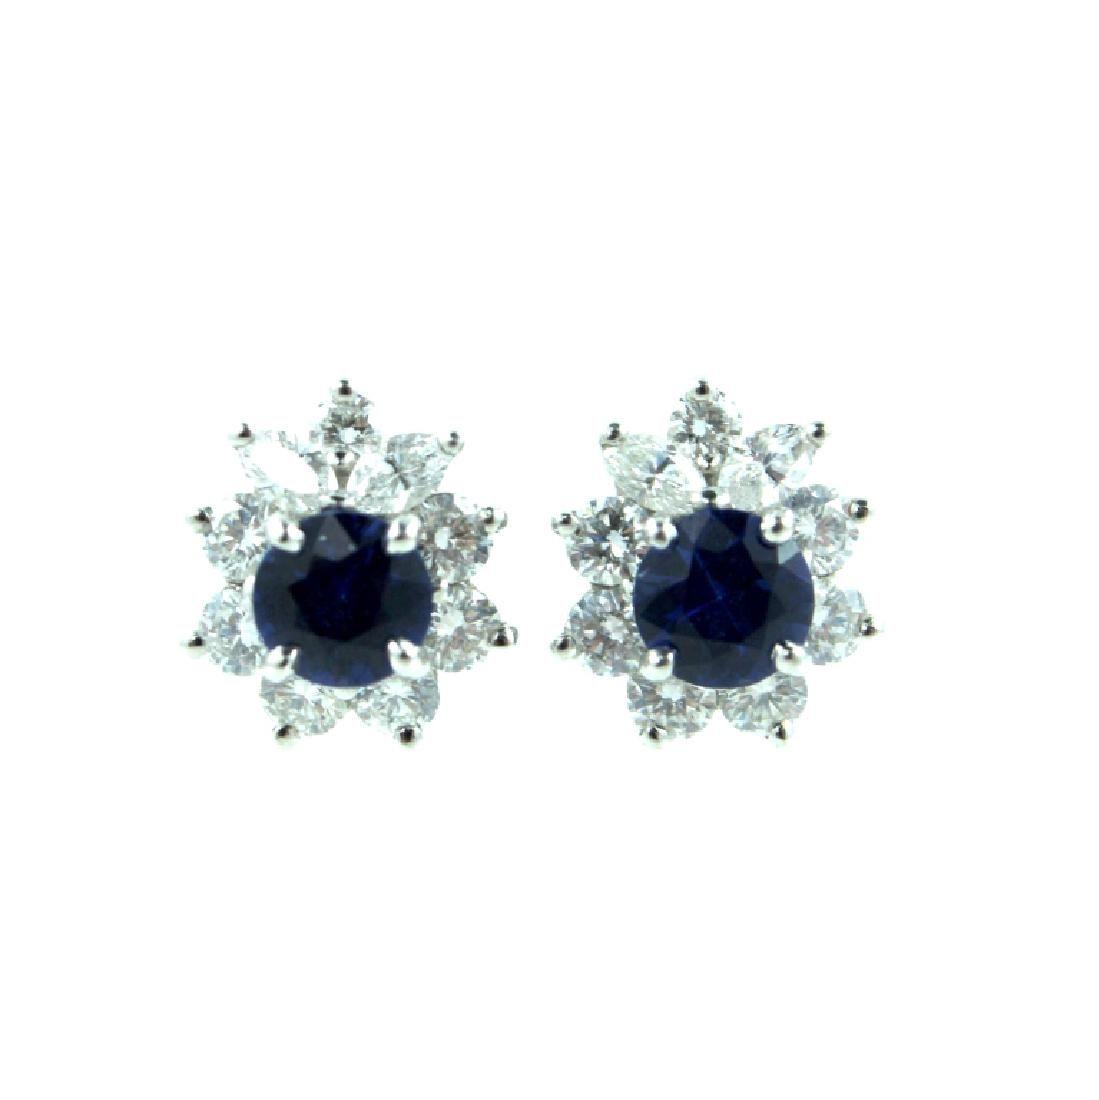 Tiffany & Co Platinum Sapphire & Diamond Earrings